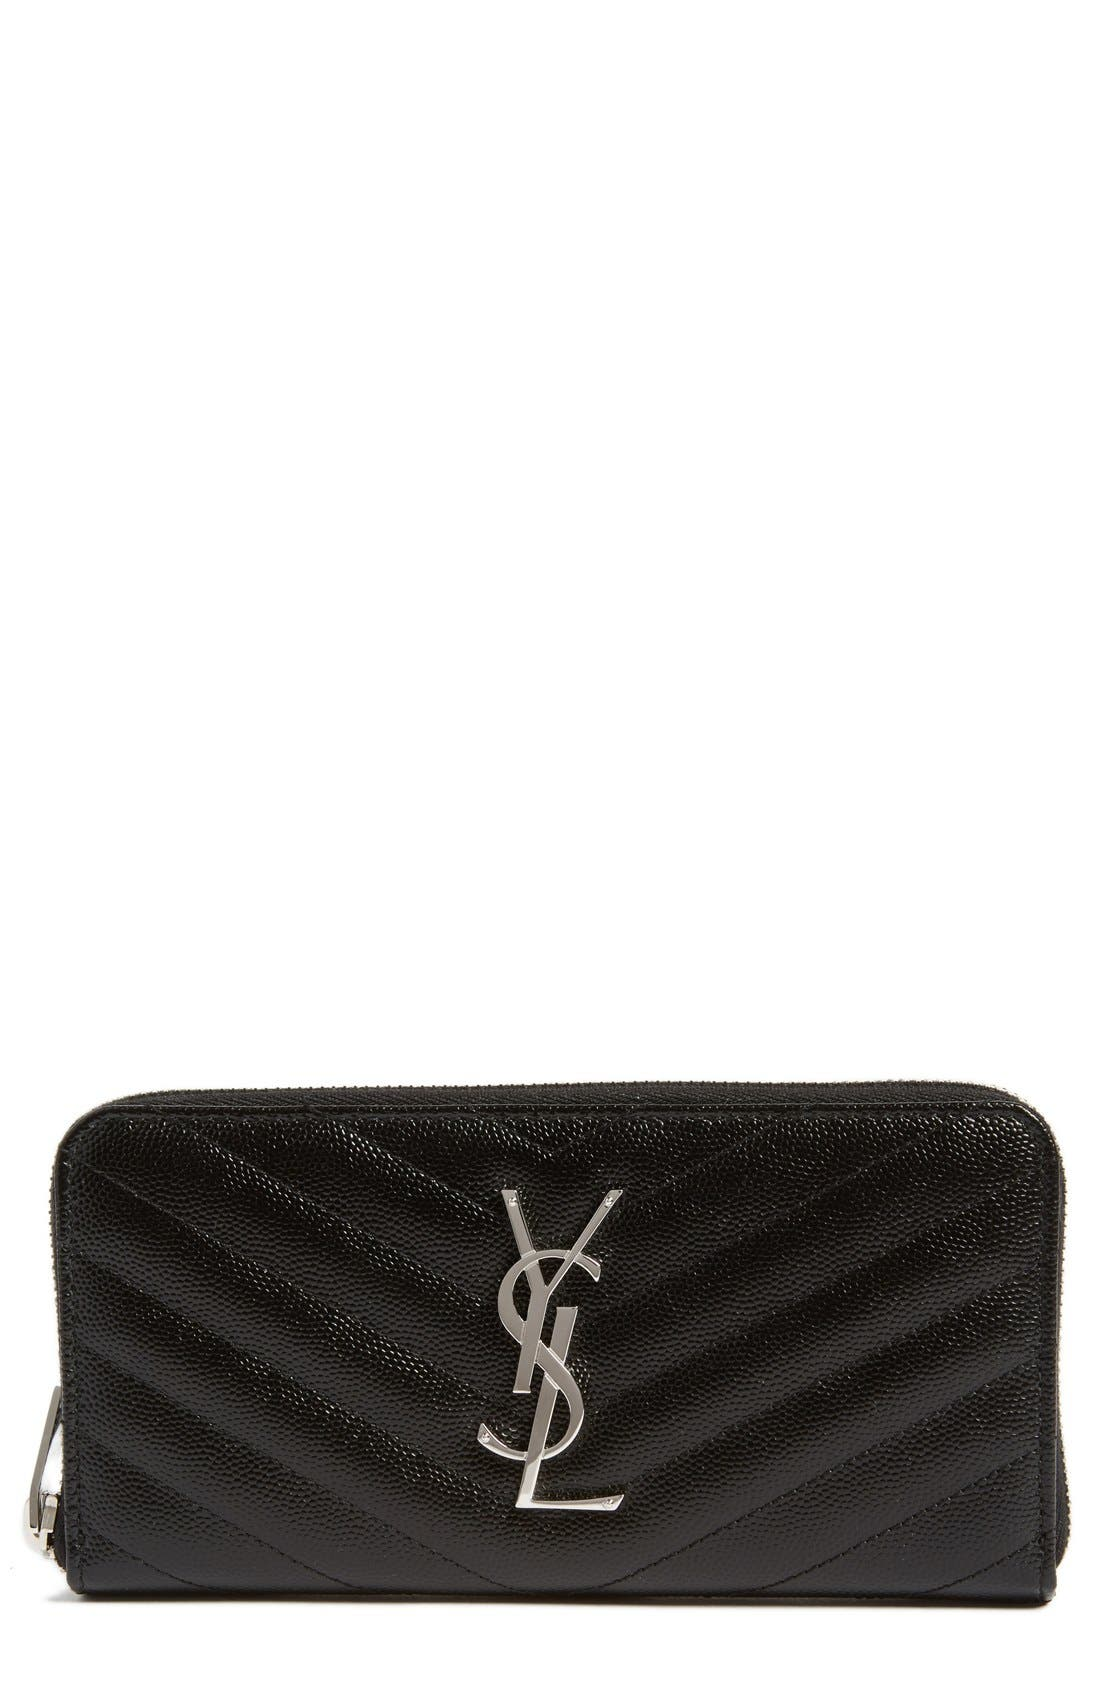 Alternate Image 1 Selected - Saint Laurent 'Monogram' Zip Around Quilted Calfskin Leather Wallet